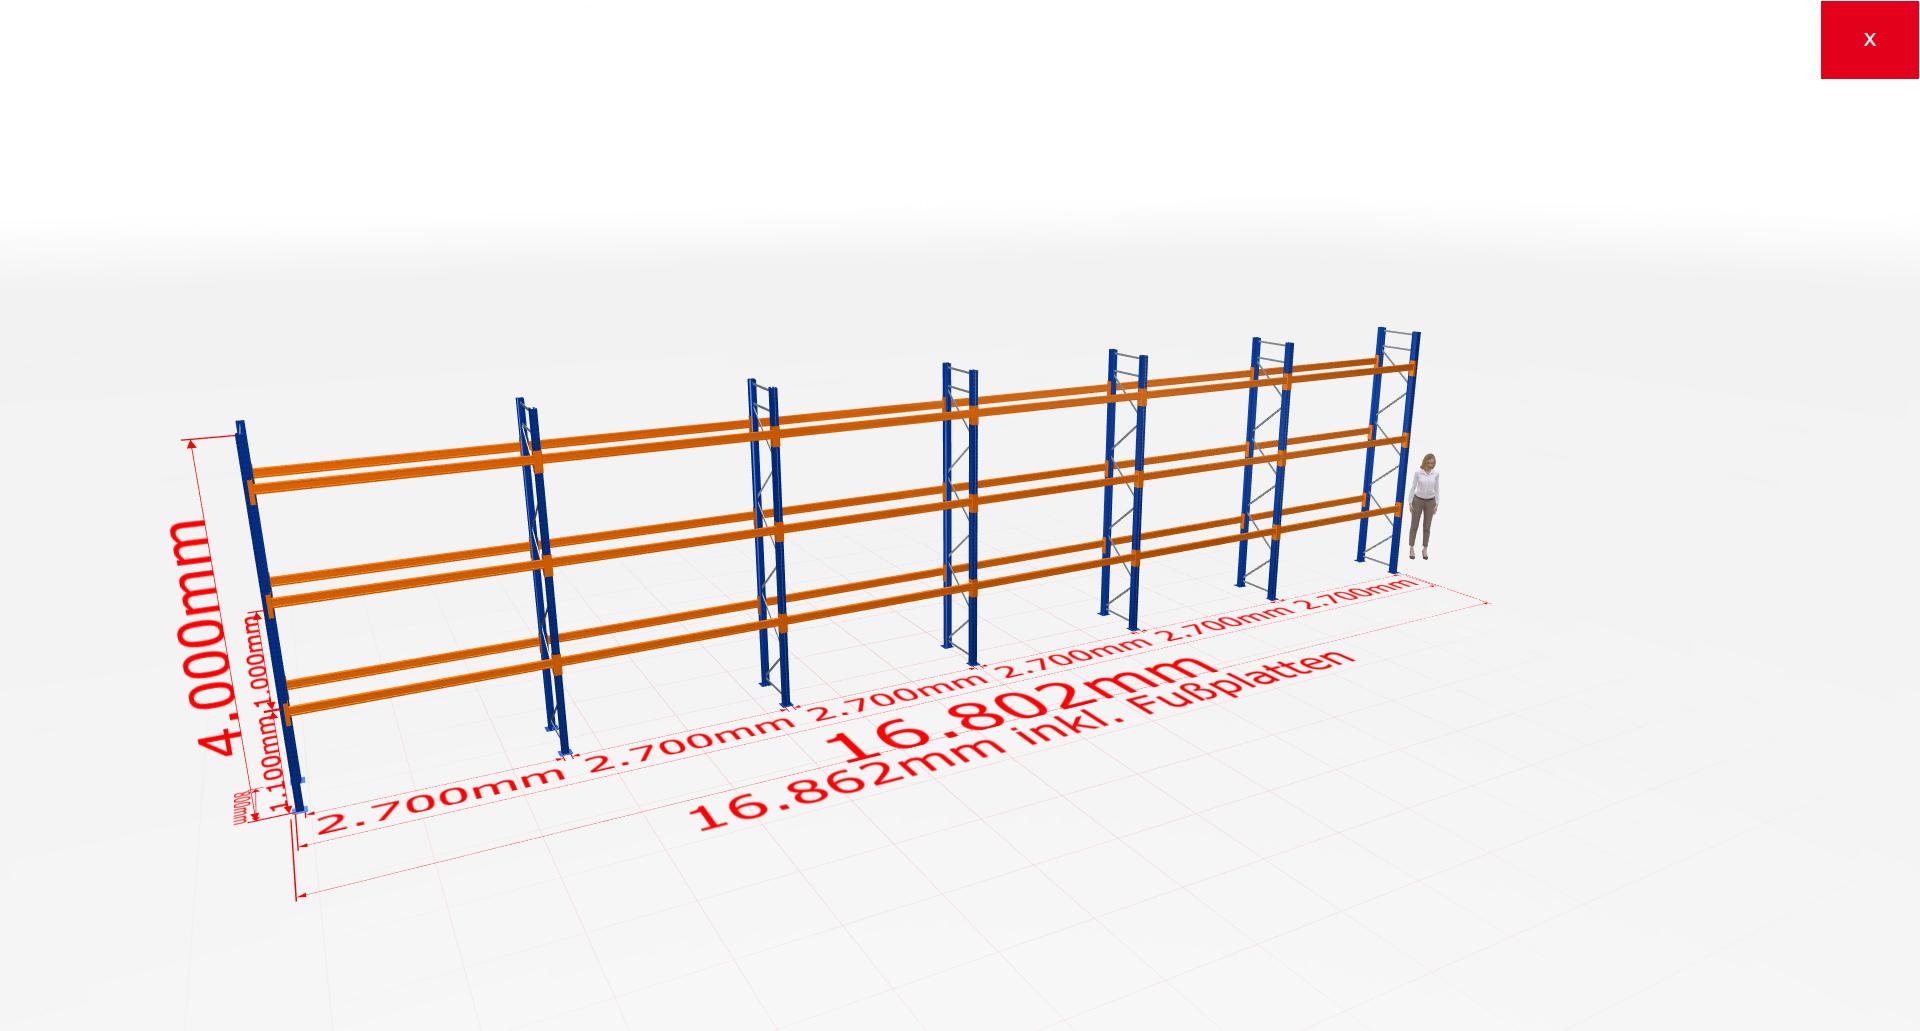 Palettenregal Komplettregal 4000x16802x800 mm (HxBxT) 3 Fachebenen SCHULTE Lagertechnik